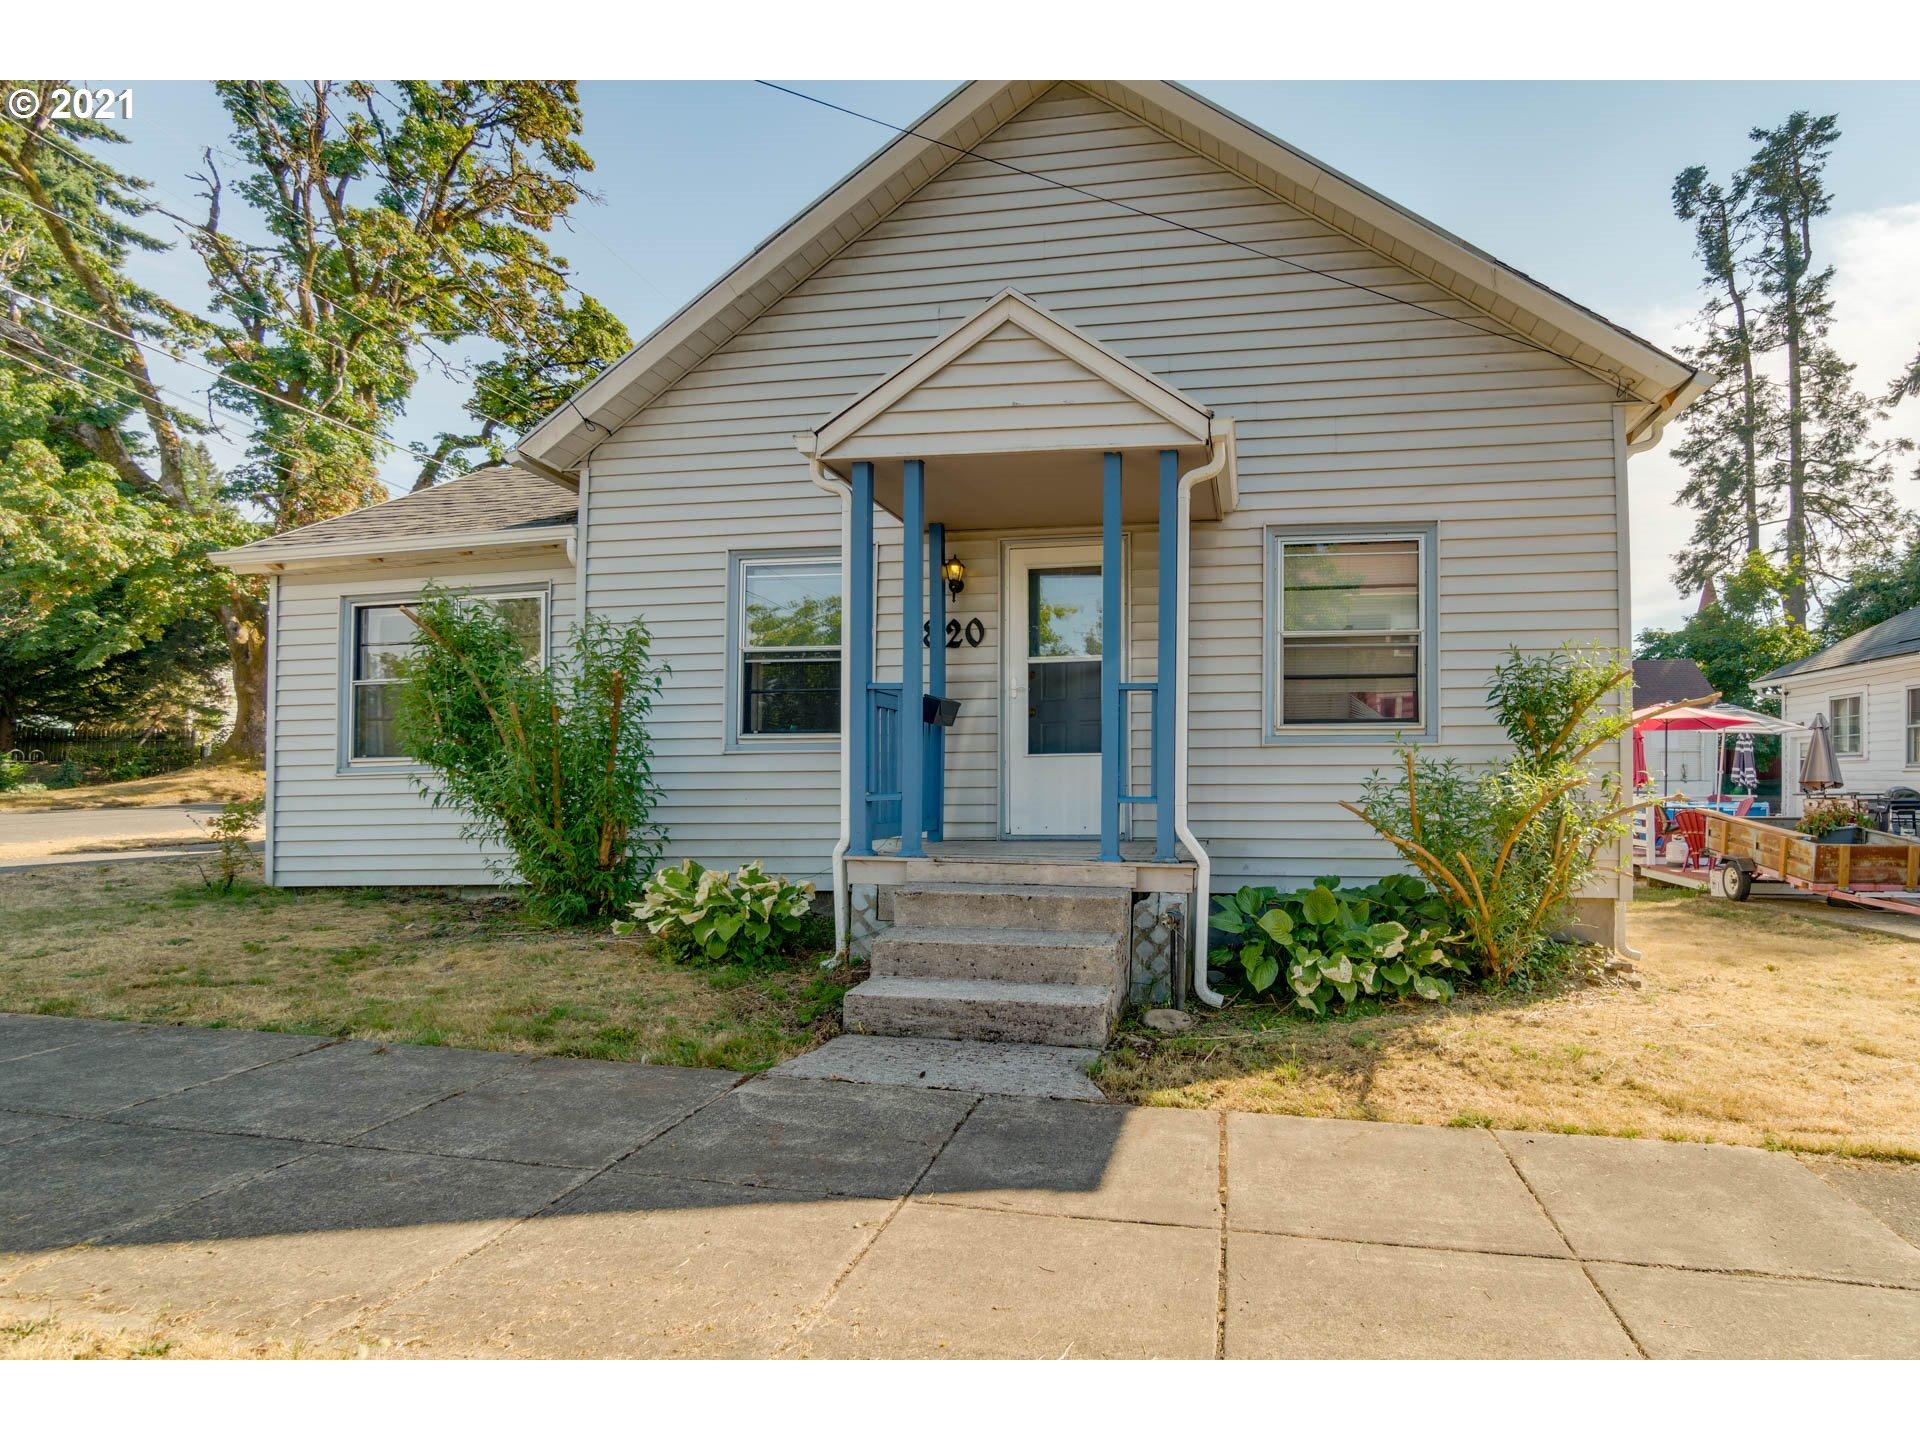 820 9TH ST, Oregon City OR 97045